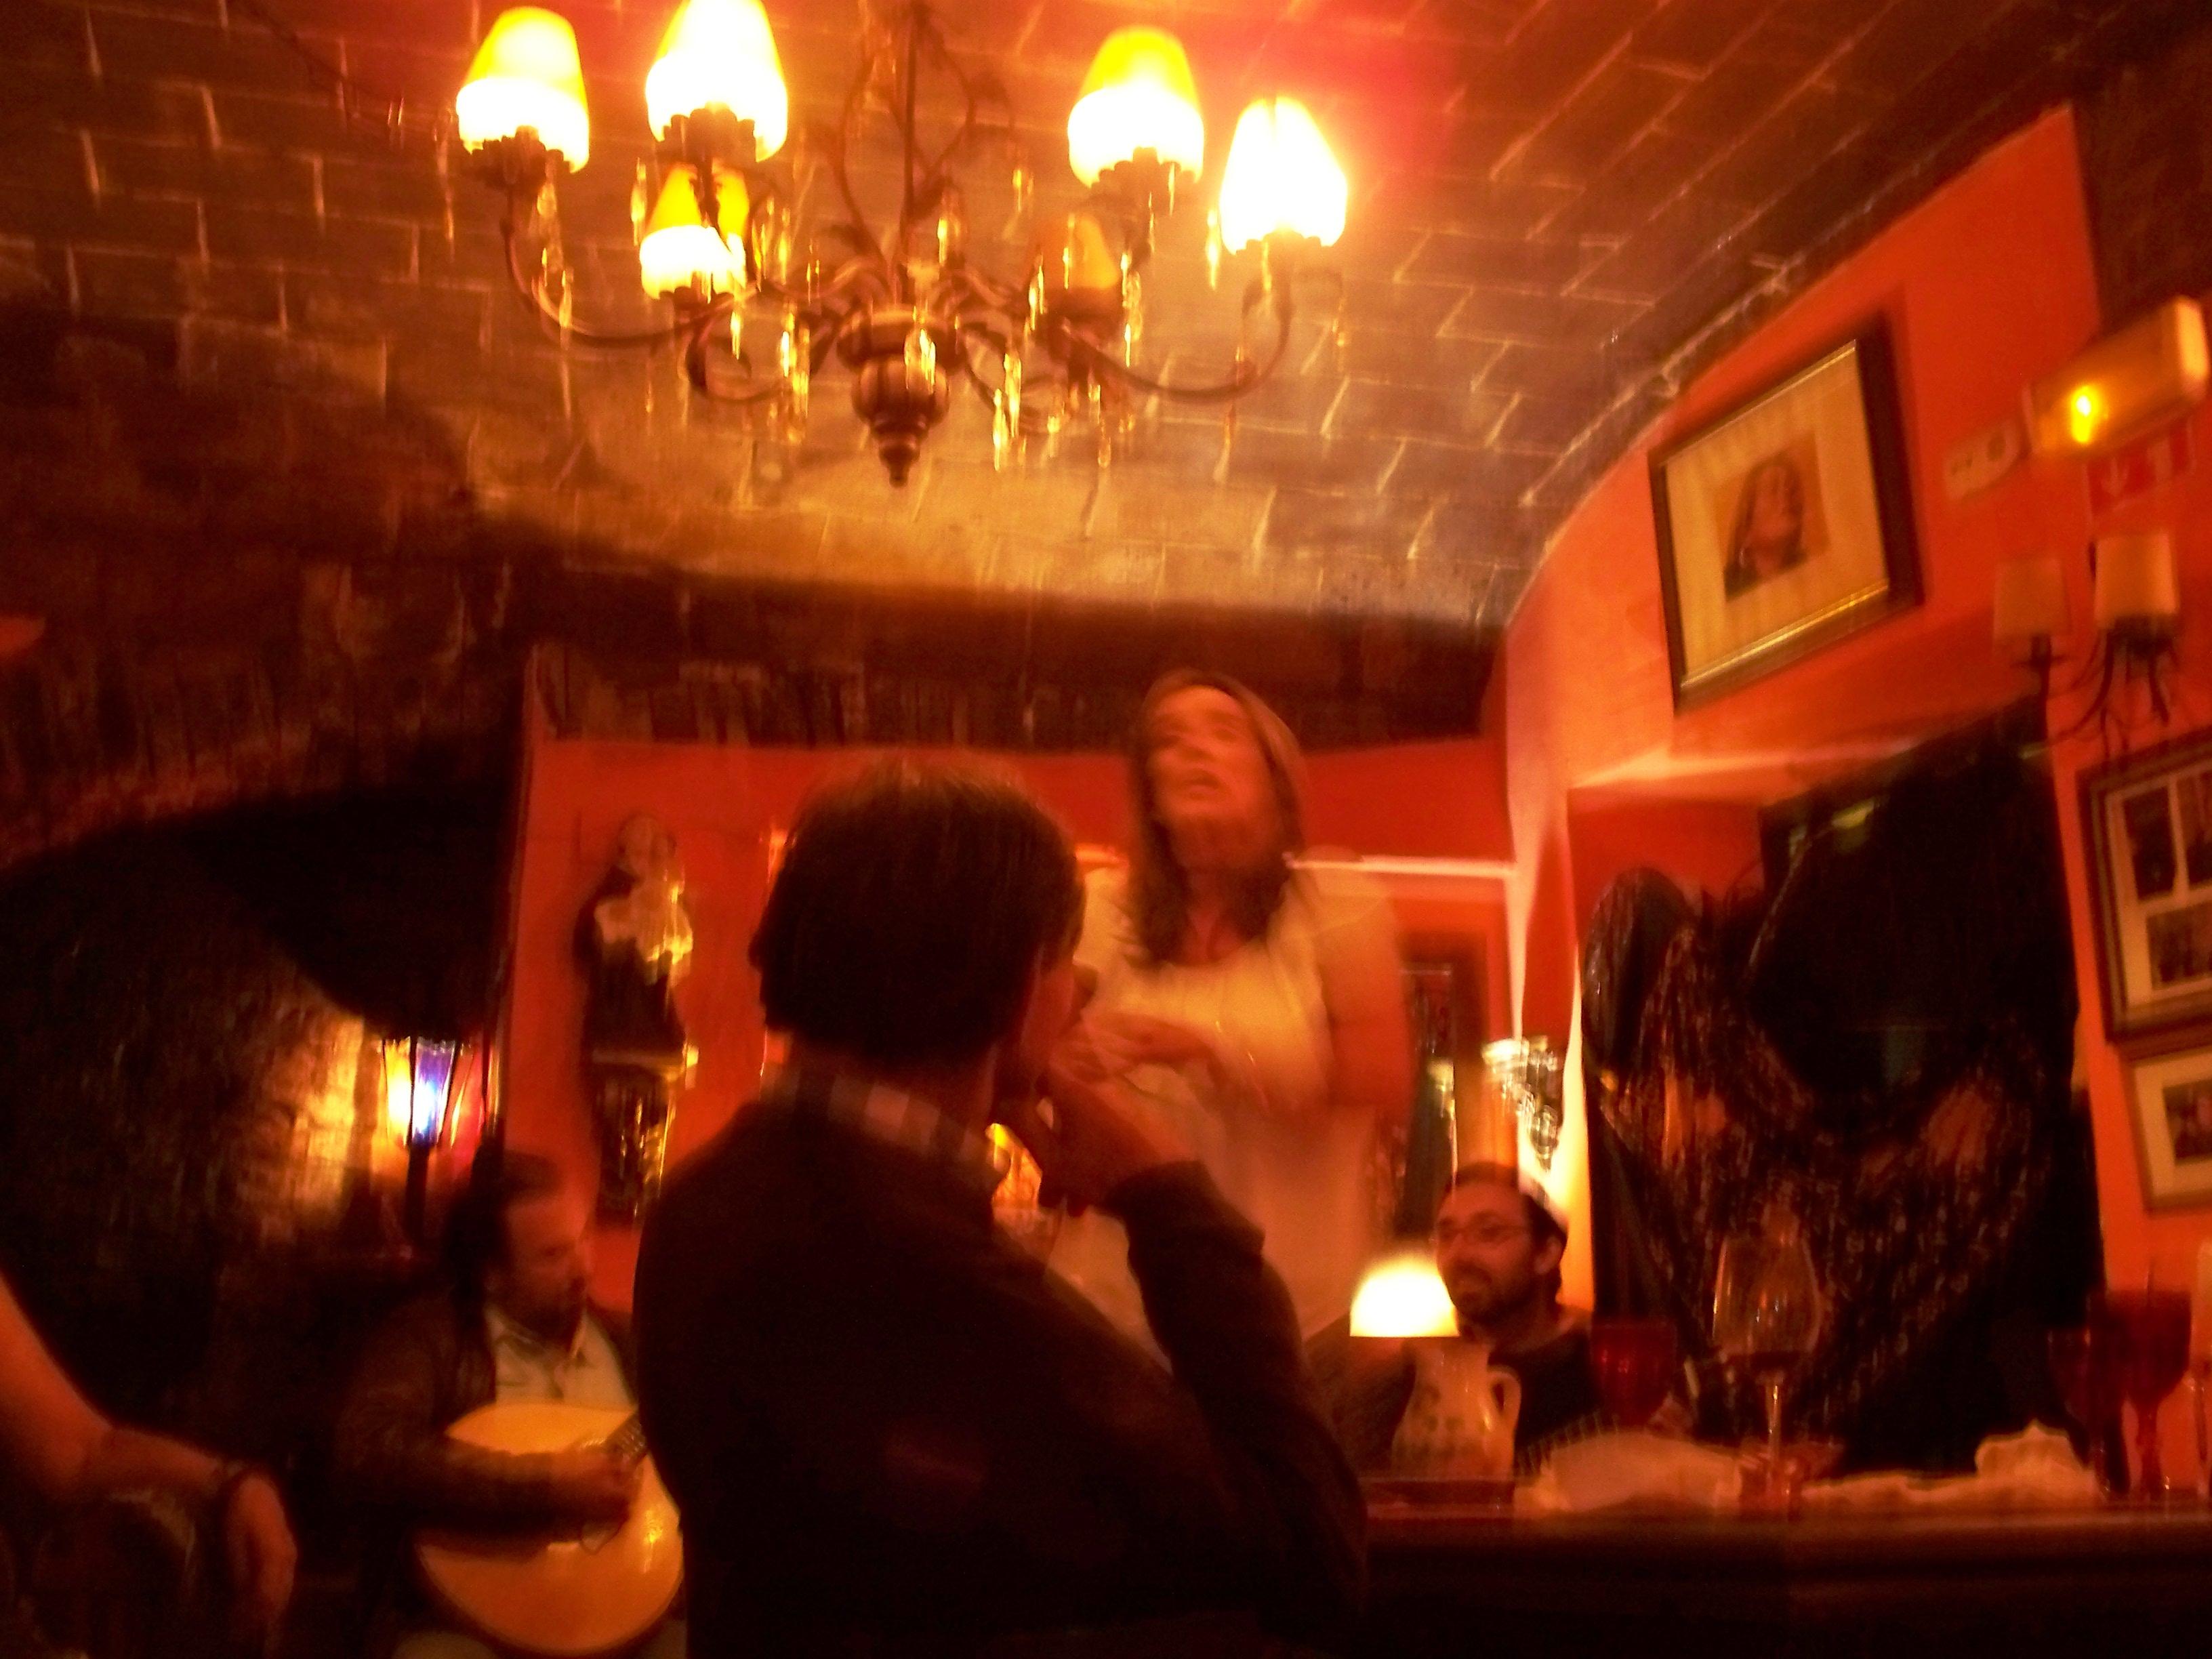 In the city of Evora, Bota Alta is the prime casa de fados, and Ines Villa-Lobos the featured singer.